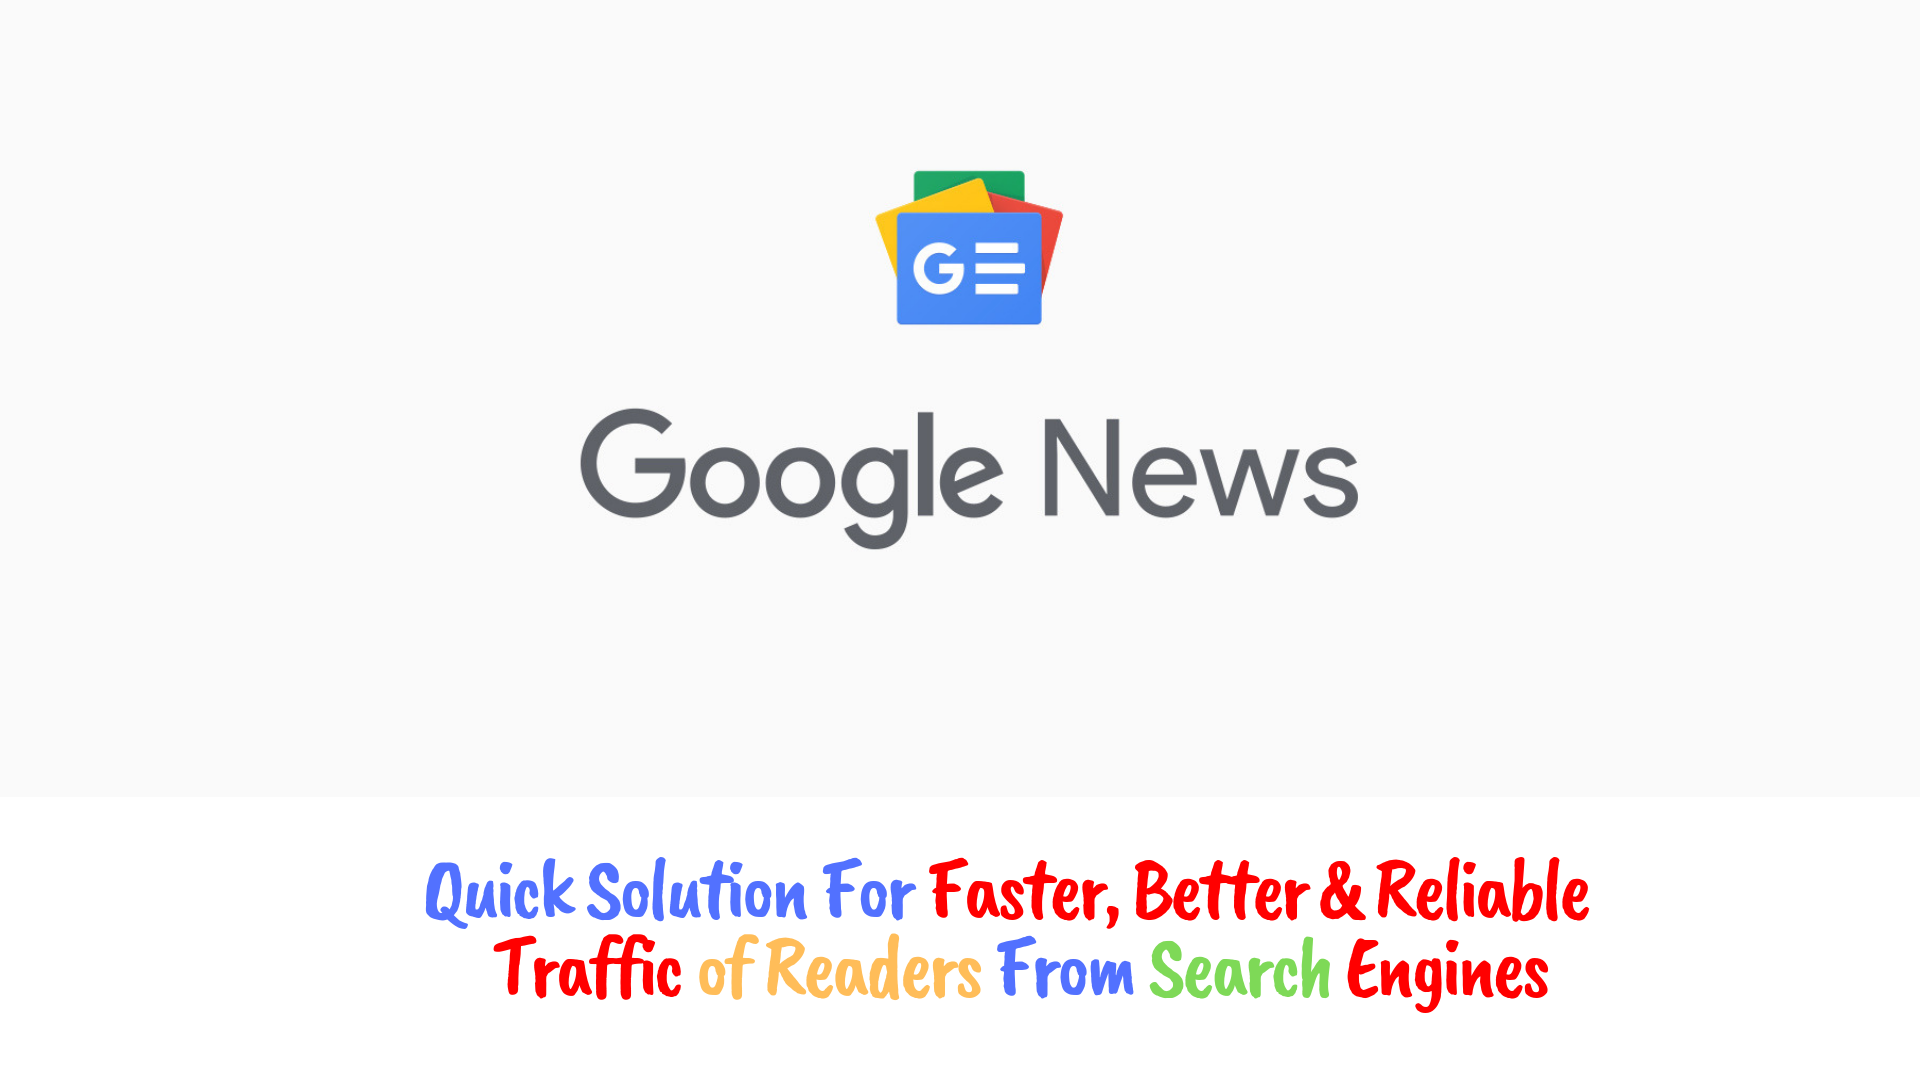 Get Your Premium Google News Website & Start Earning Today